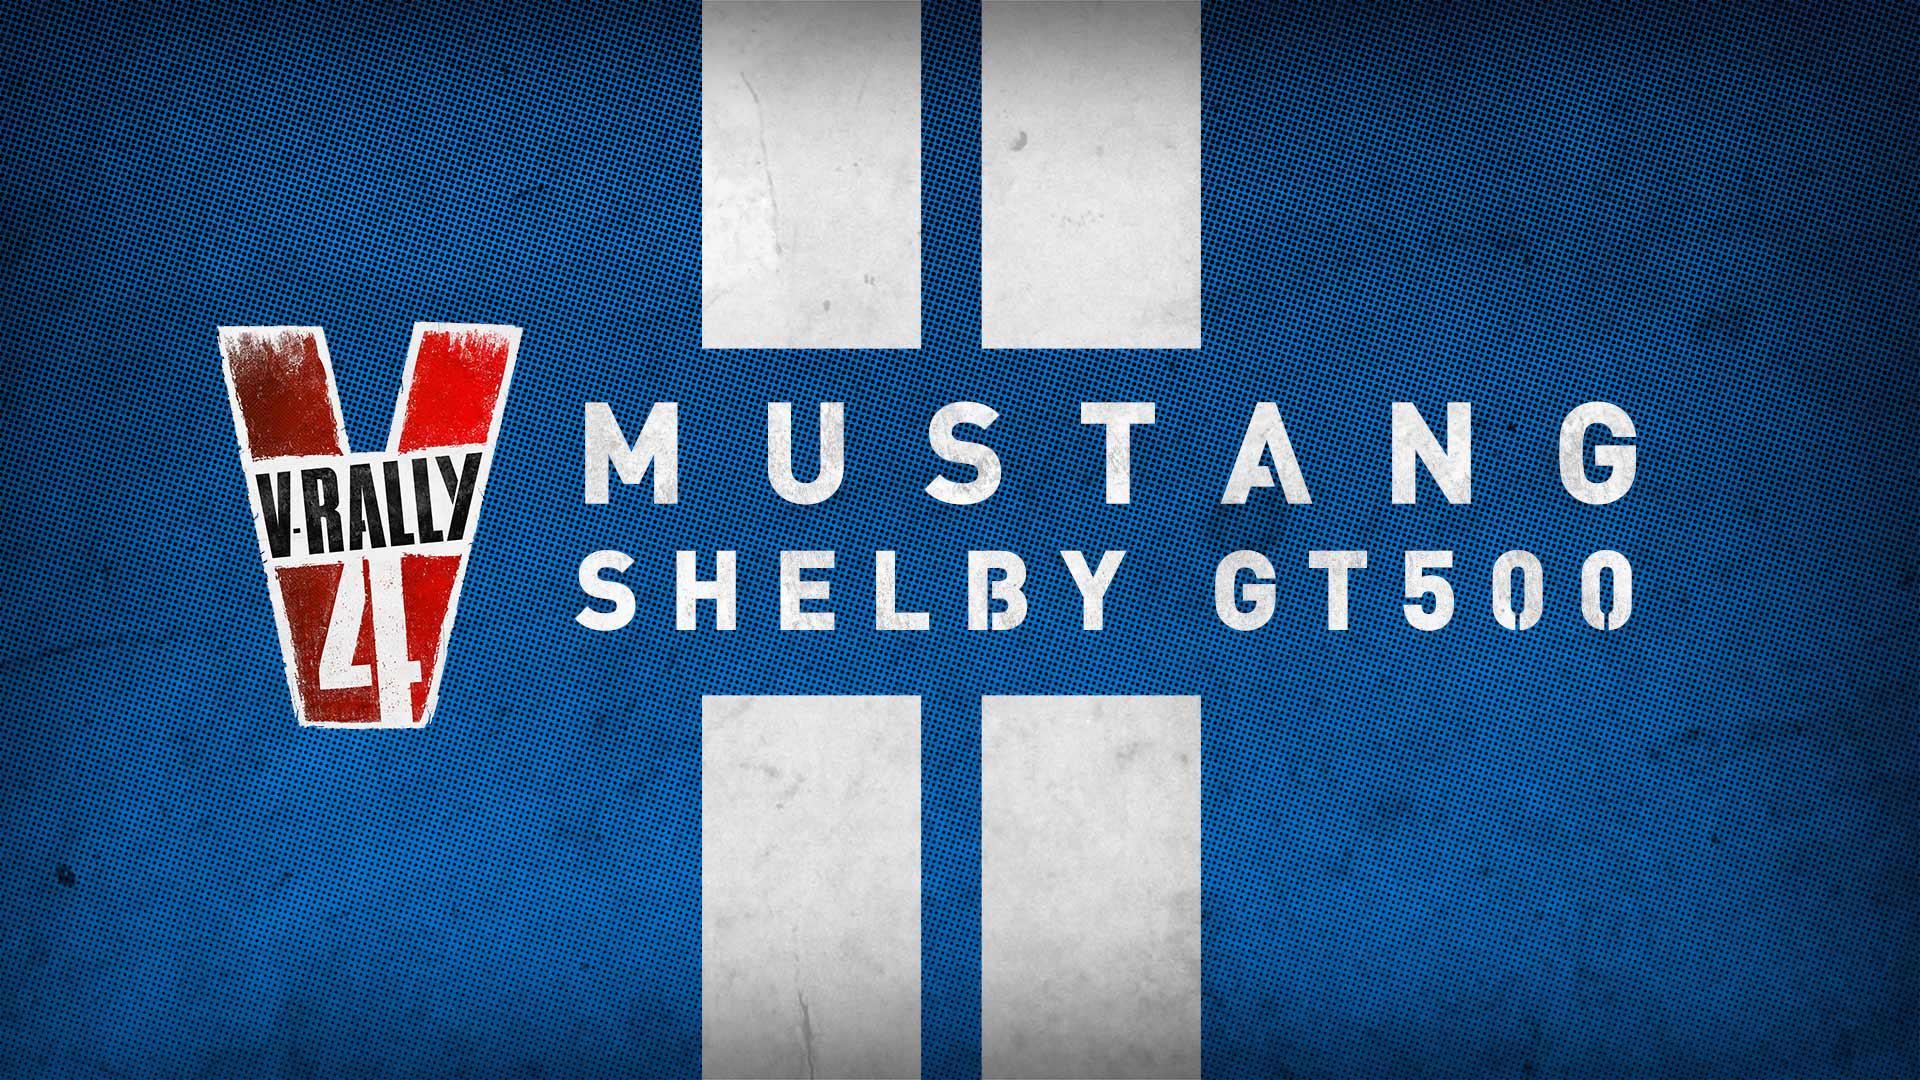 V Rally 4 - Ford Shelby GT500